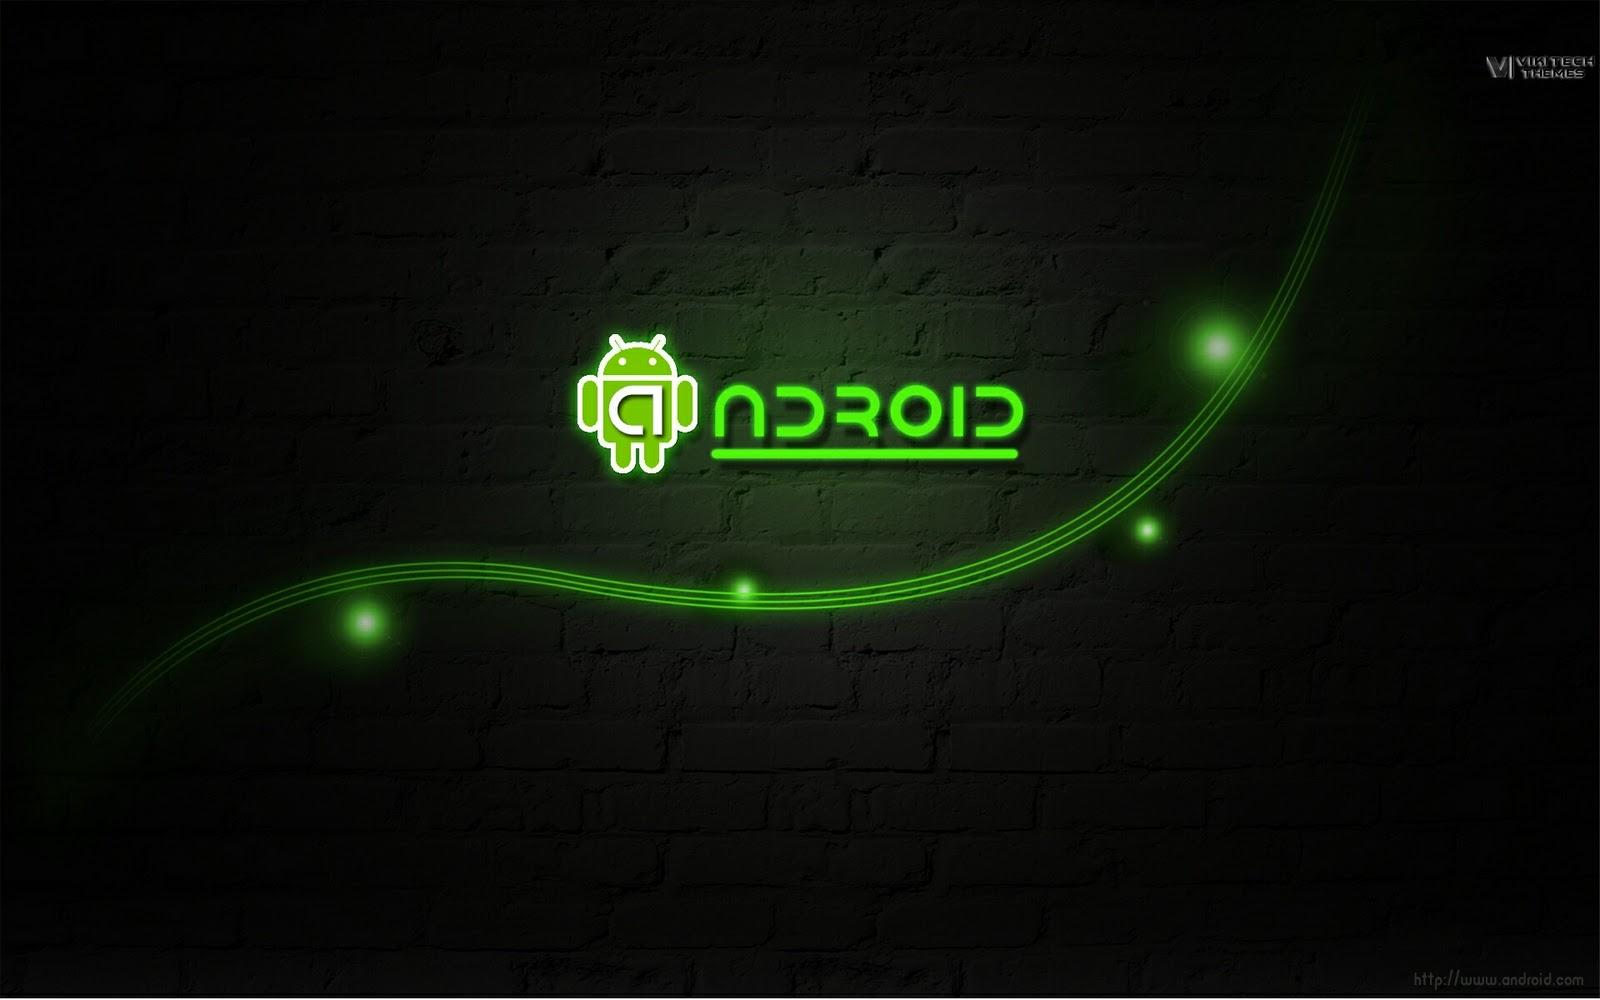 http://2.bp.blogspot.com/_E26Ndy_oKVc/TPlp6GrvYII/AAAAAAAAAxQ/r7wcshdL6Mw/s1600/Wallpaper+Android+%25289%2529.jpg